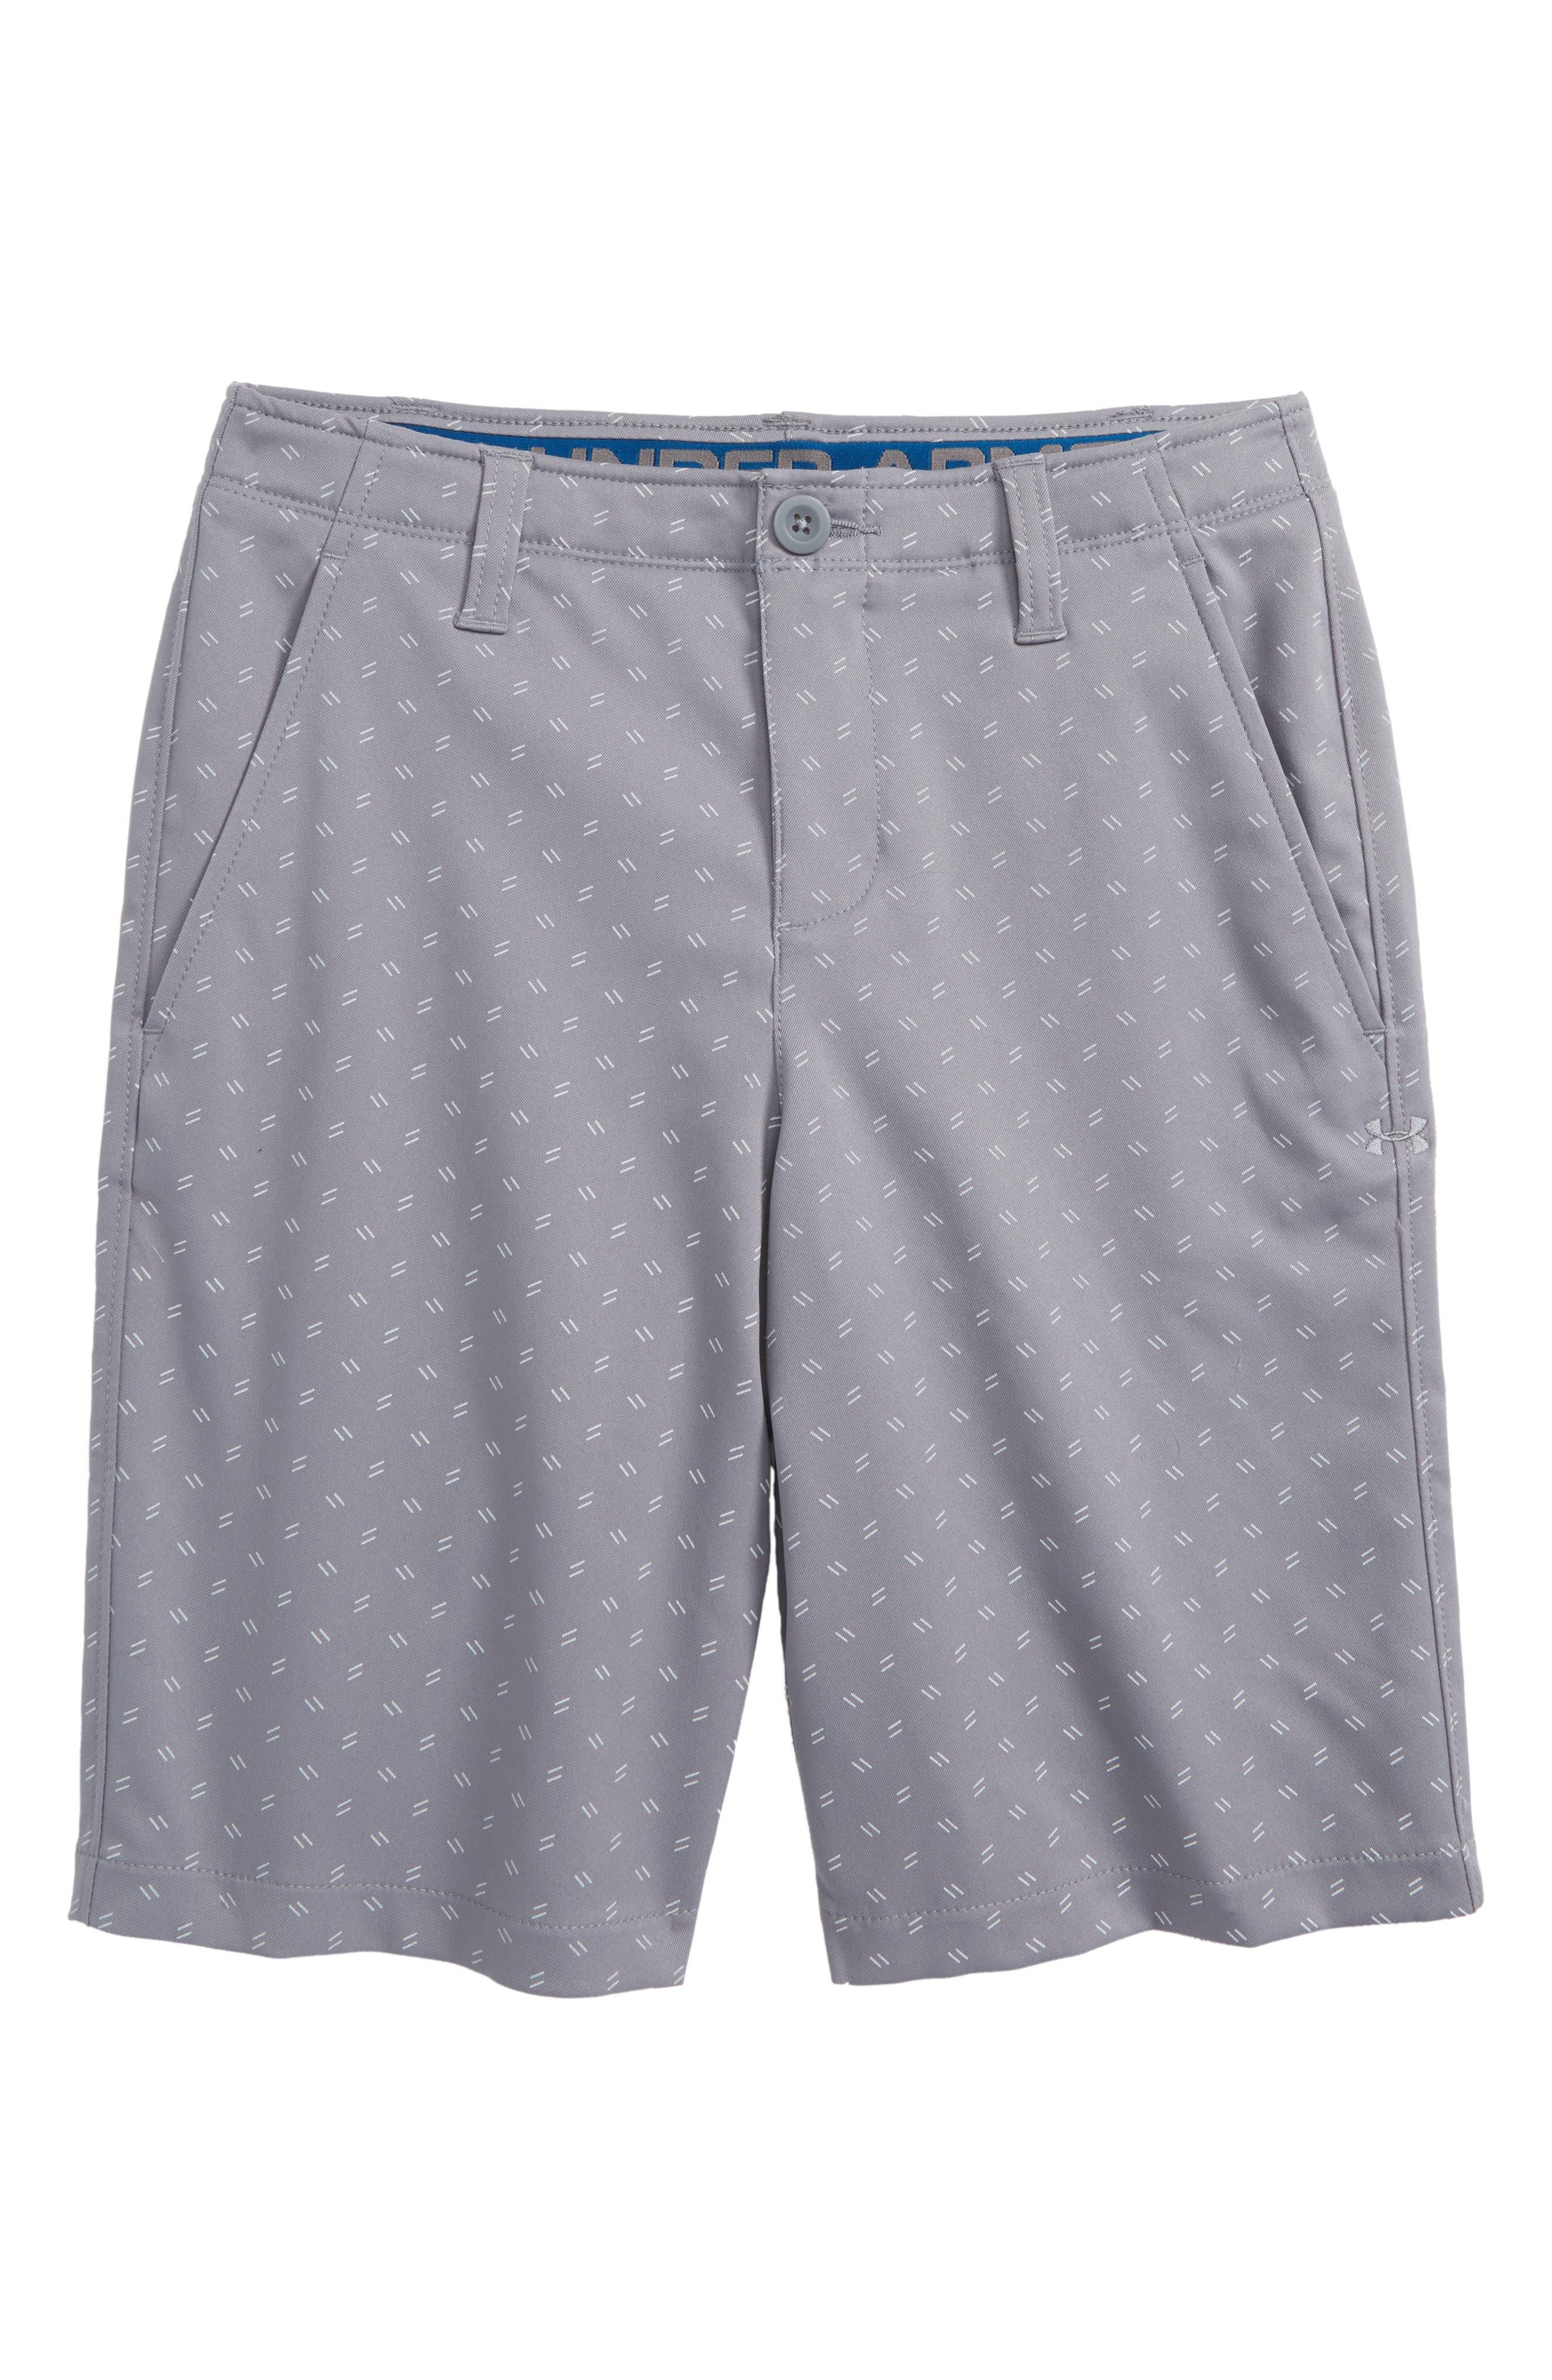 Boys Under Armour Match Play Golf Shorts